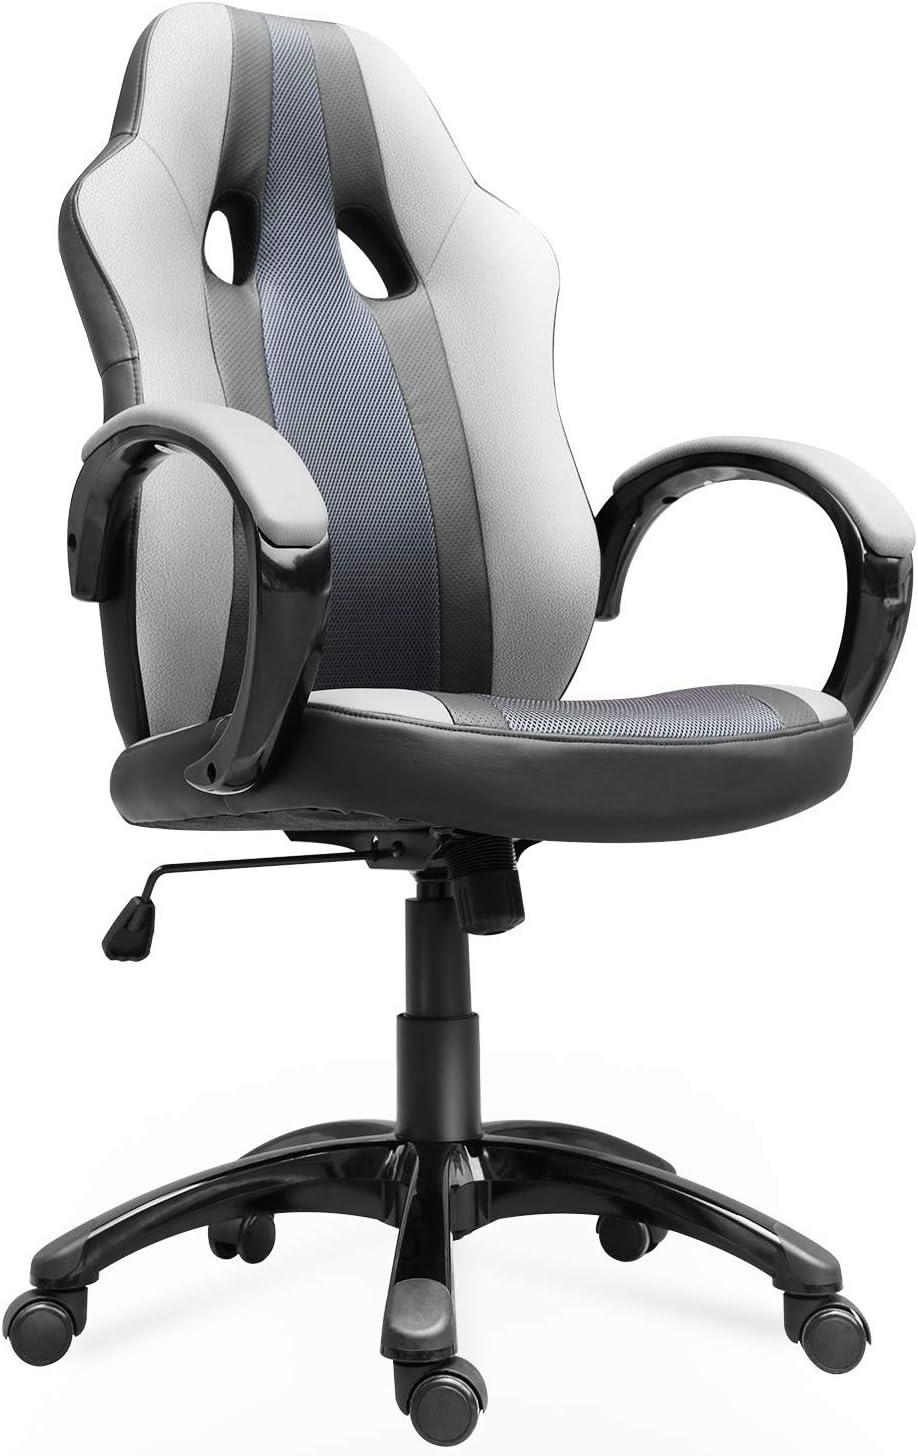 Smugdesk High Back Ergonomic Desk Chairs